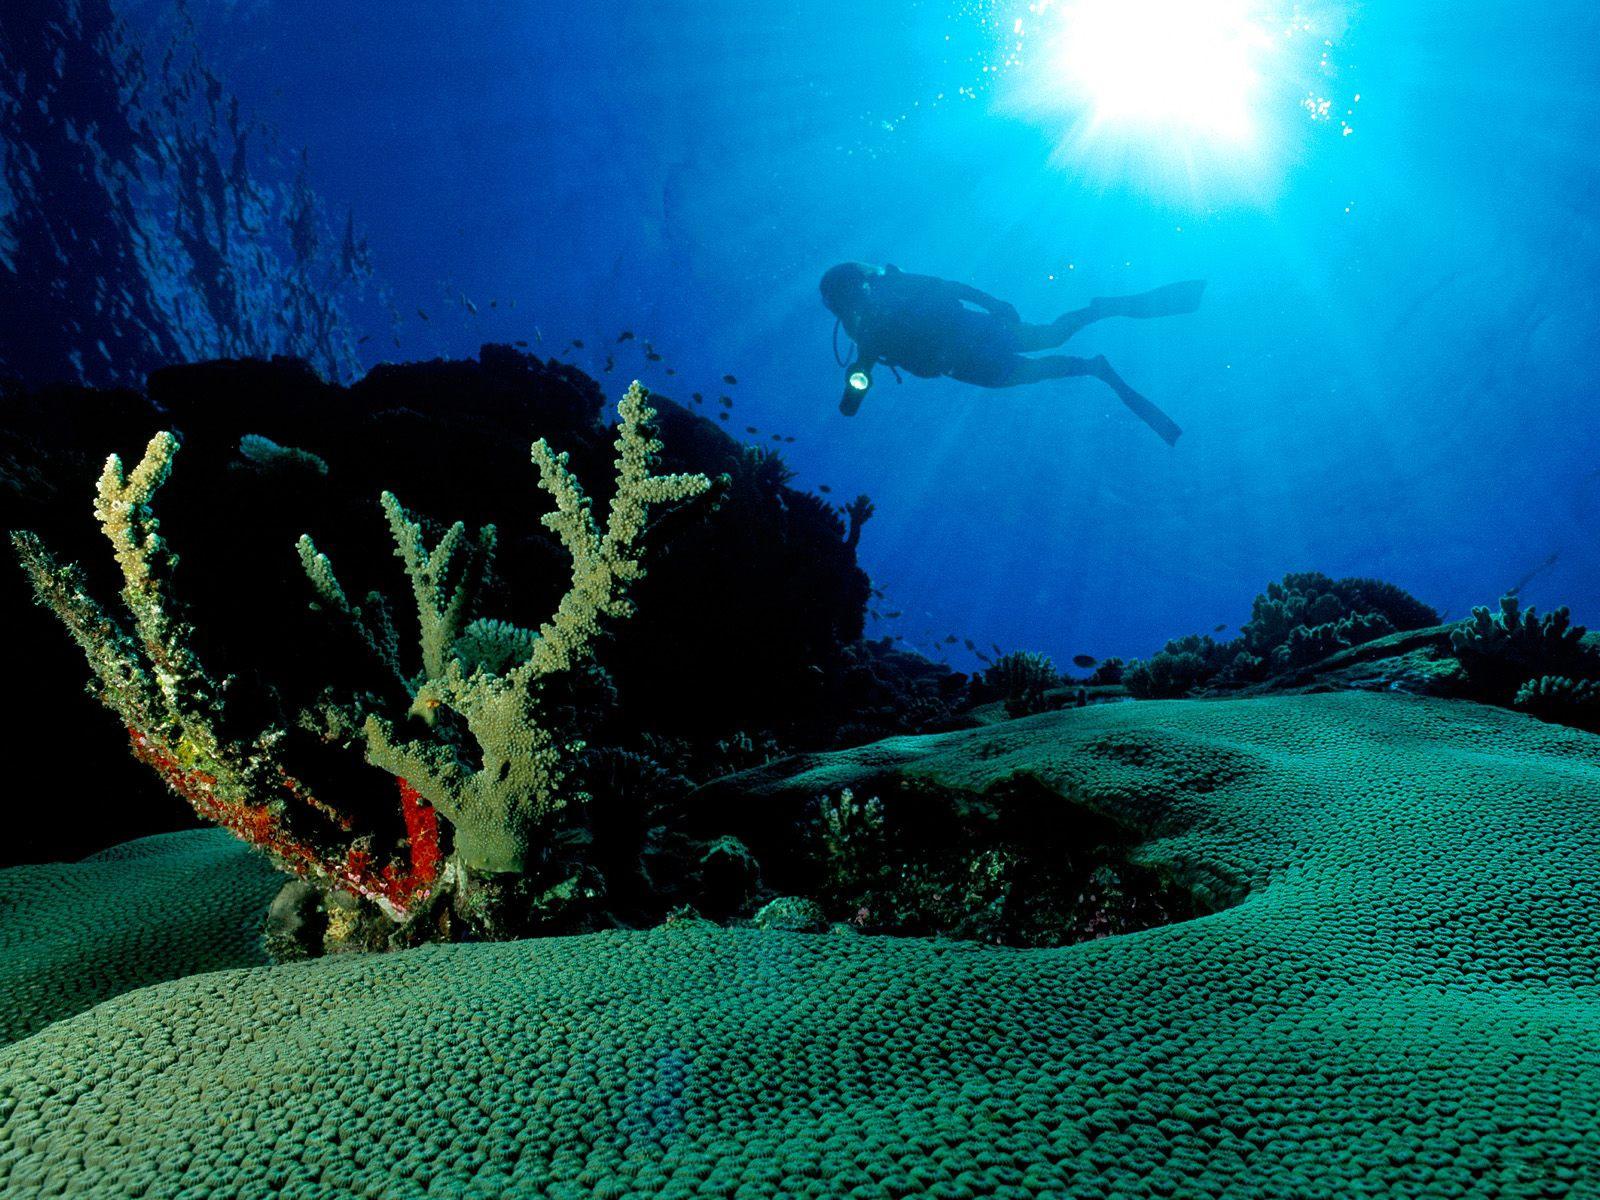 http://3.bp.blogspot.com/-xnrfzQQYDMI/TkrR-nH3JuI/AAAAAAAALks/gIYfl6SMlaM/s1600/Underwater+Wallpapers+%252823%2529.jpg